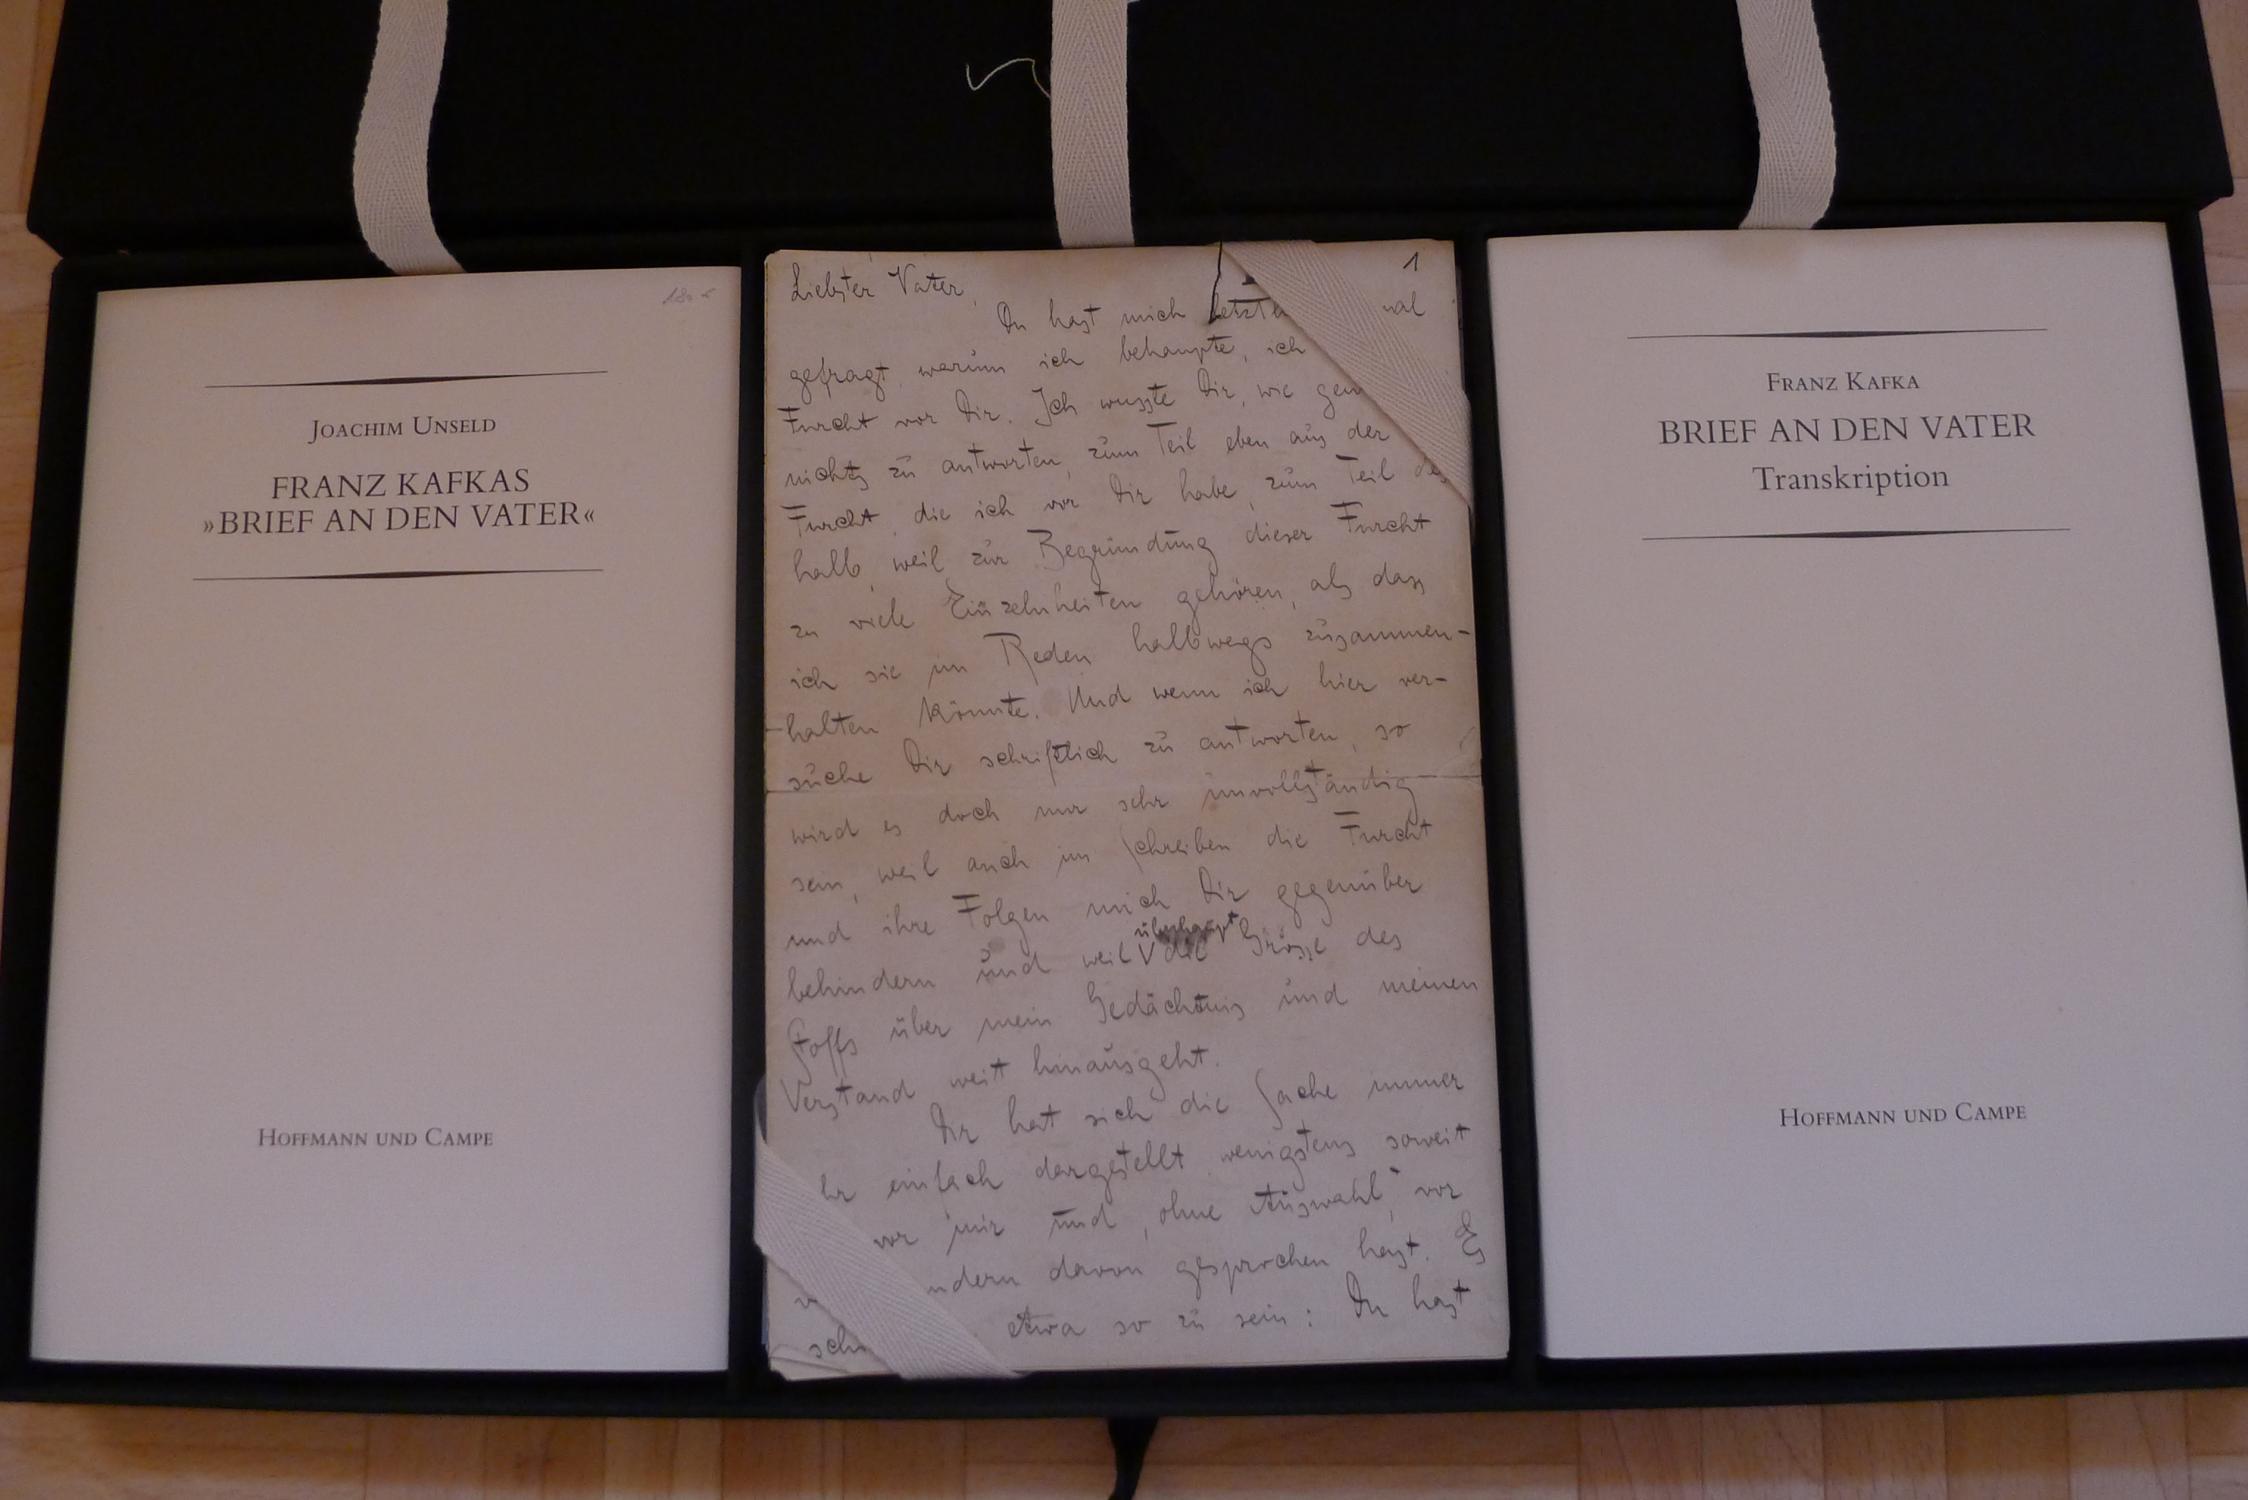 Brief an den Vater, Faksimile, Transkription, Joachim Unseld: Franz Kafkas Brief an den Vater,: ...